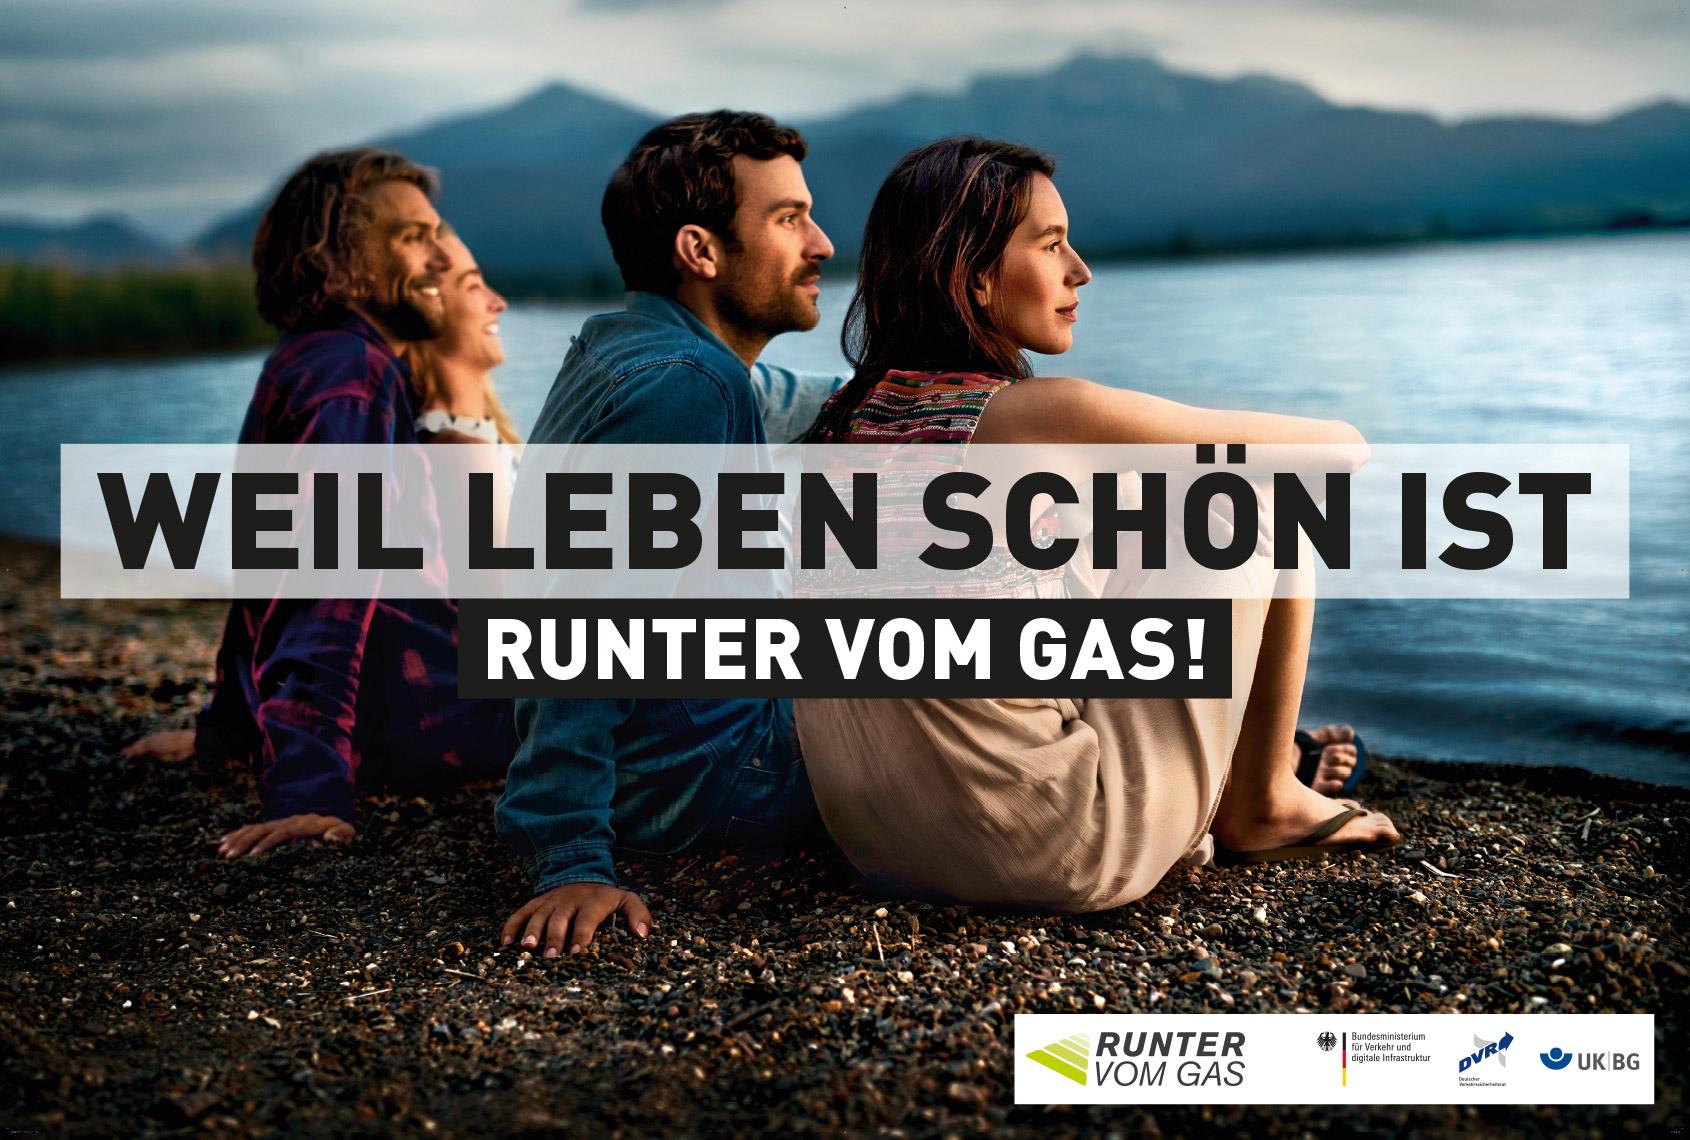 3790x2540_DVR_Autobahnplakate_Leben_schoen-2.jpg